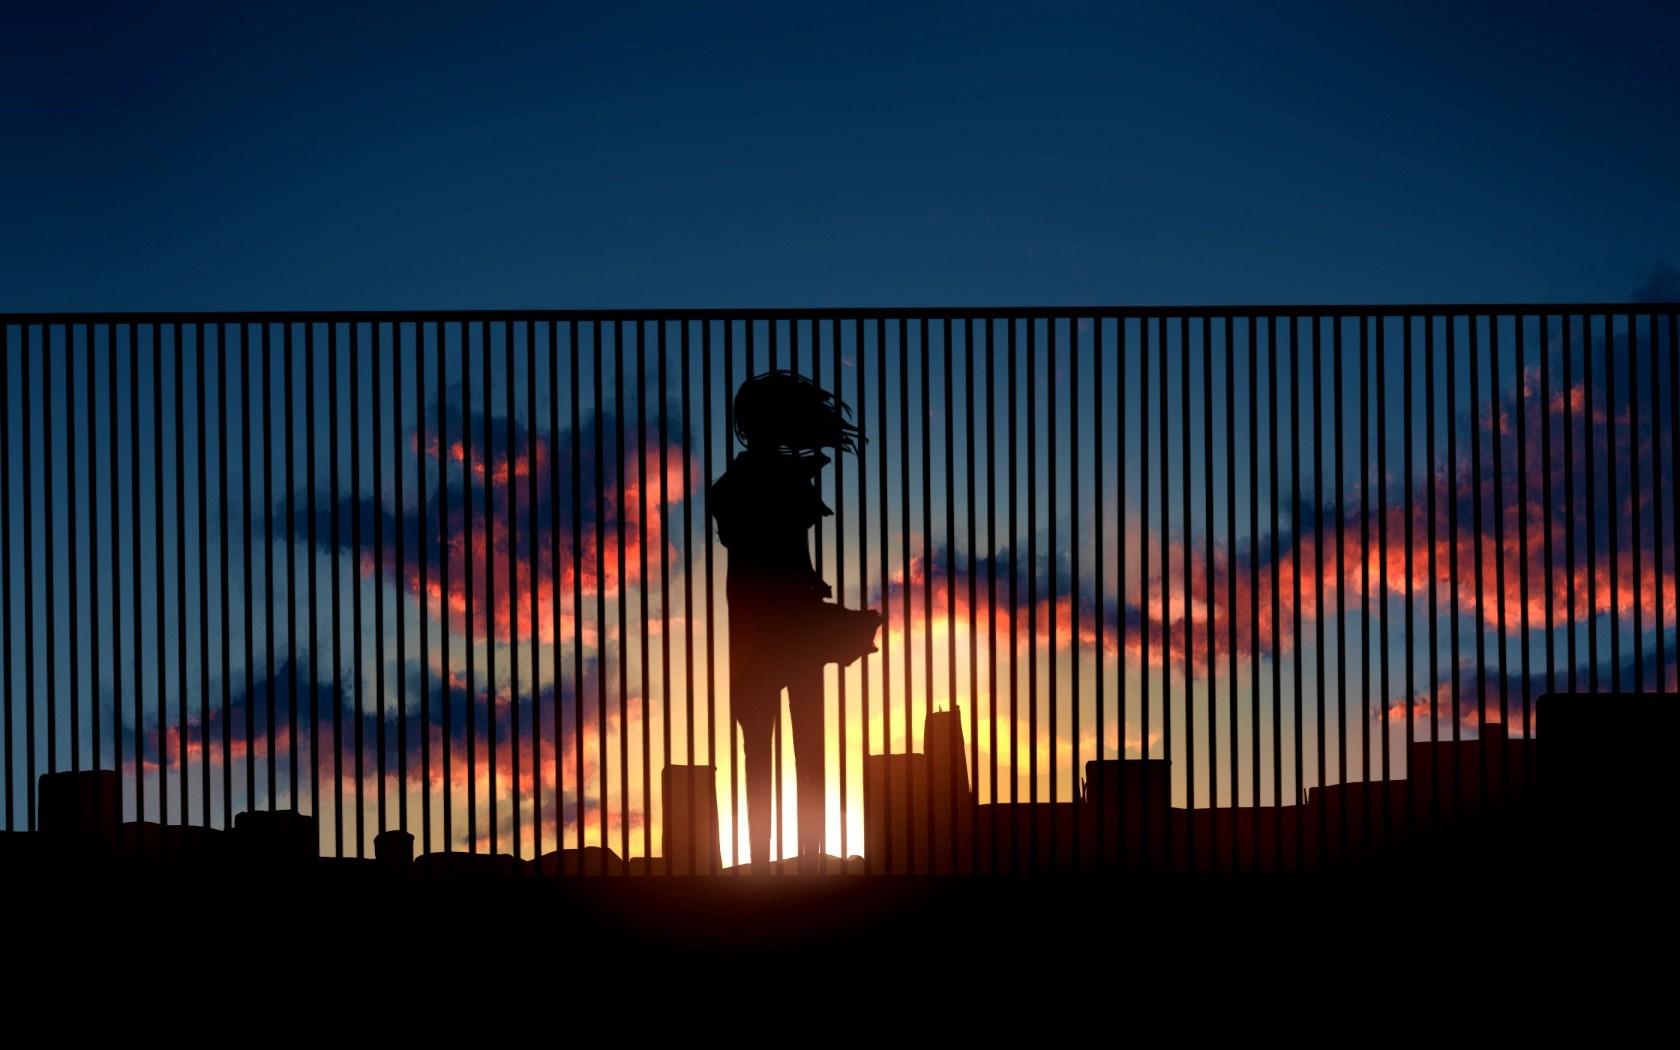 Pubg Wallpapers Pinterest: 13 Wonderful HD Anime City Wallpapers